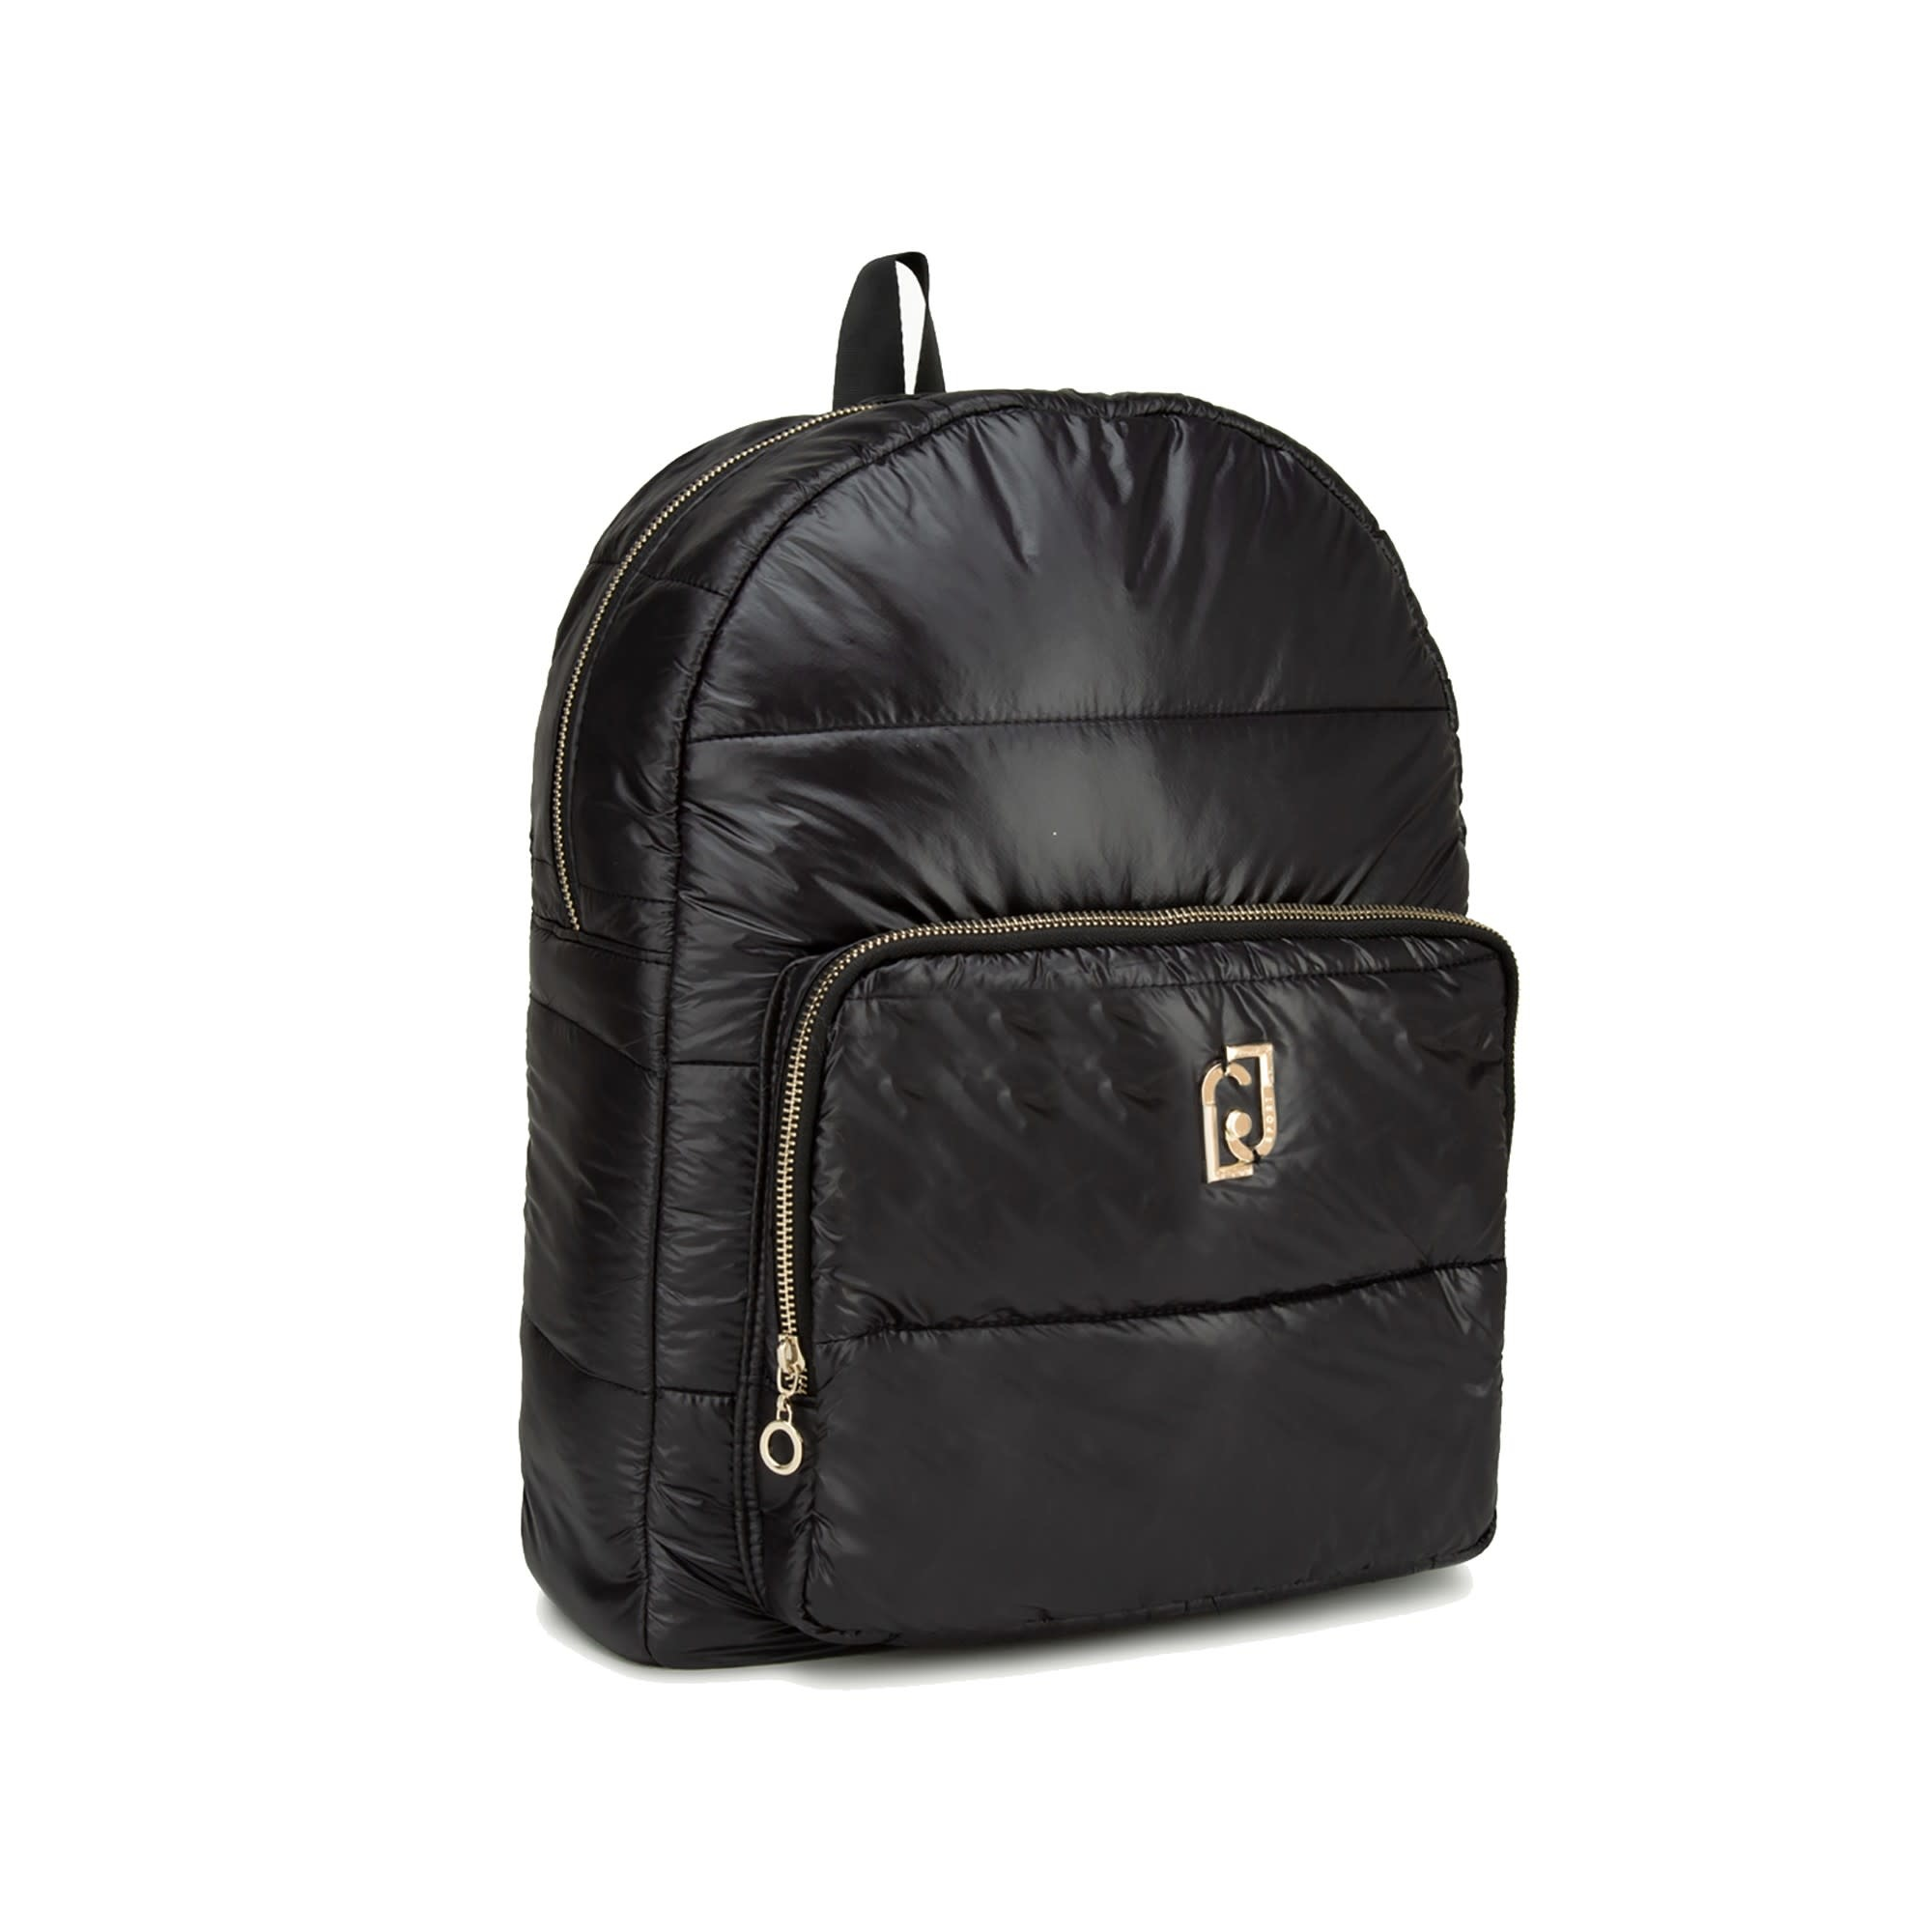 Backpack bag-1